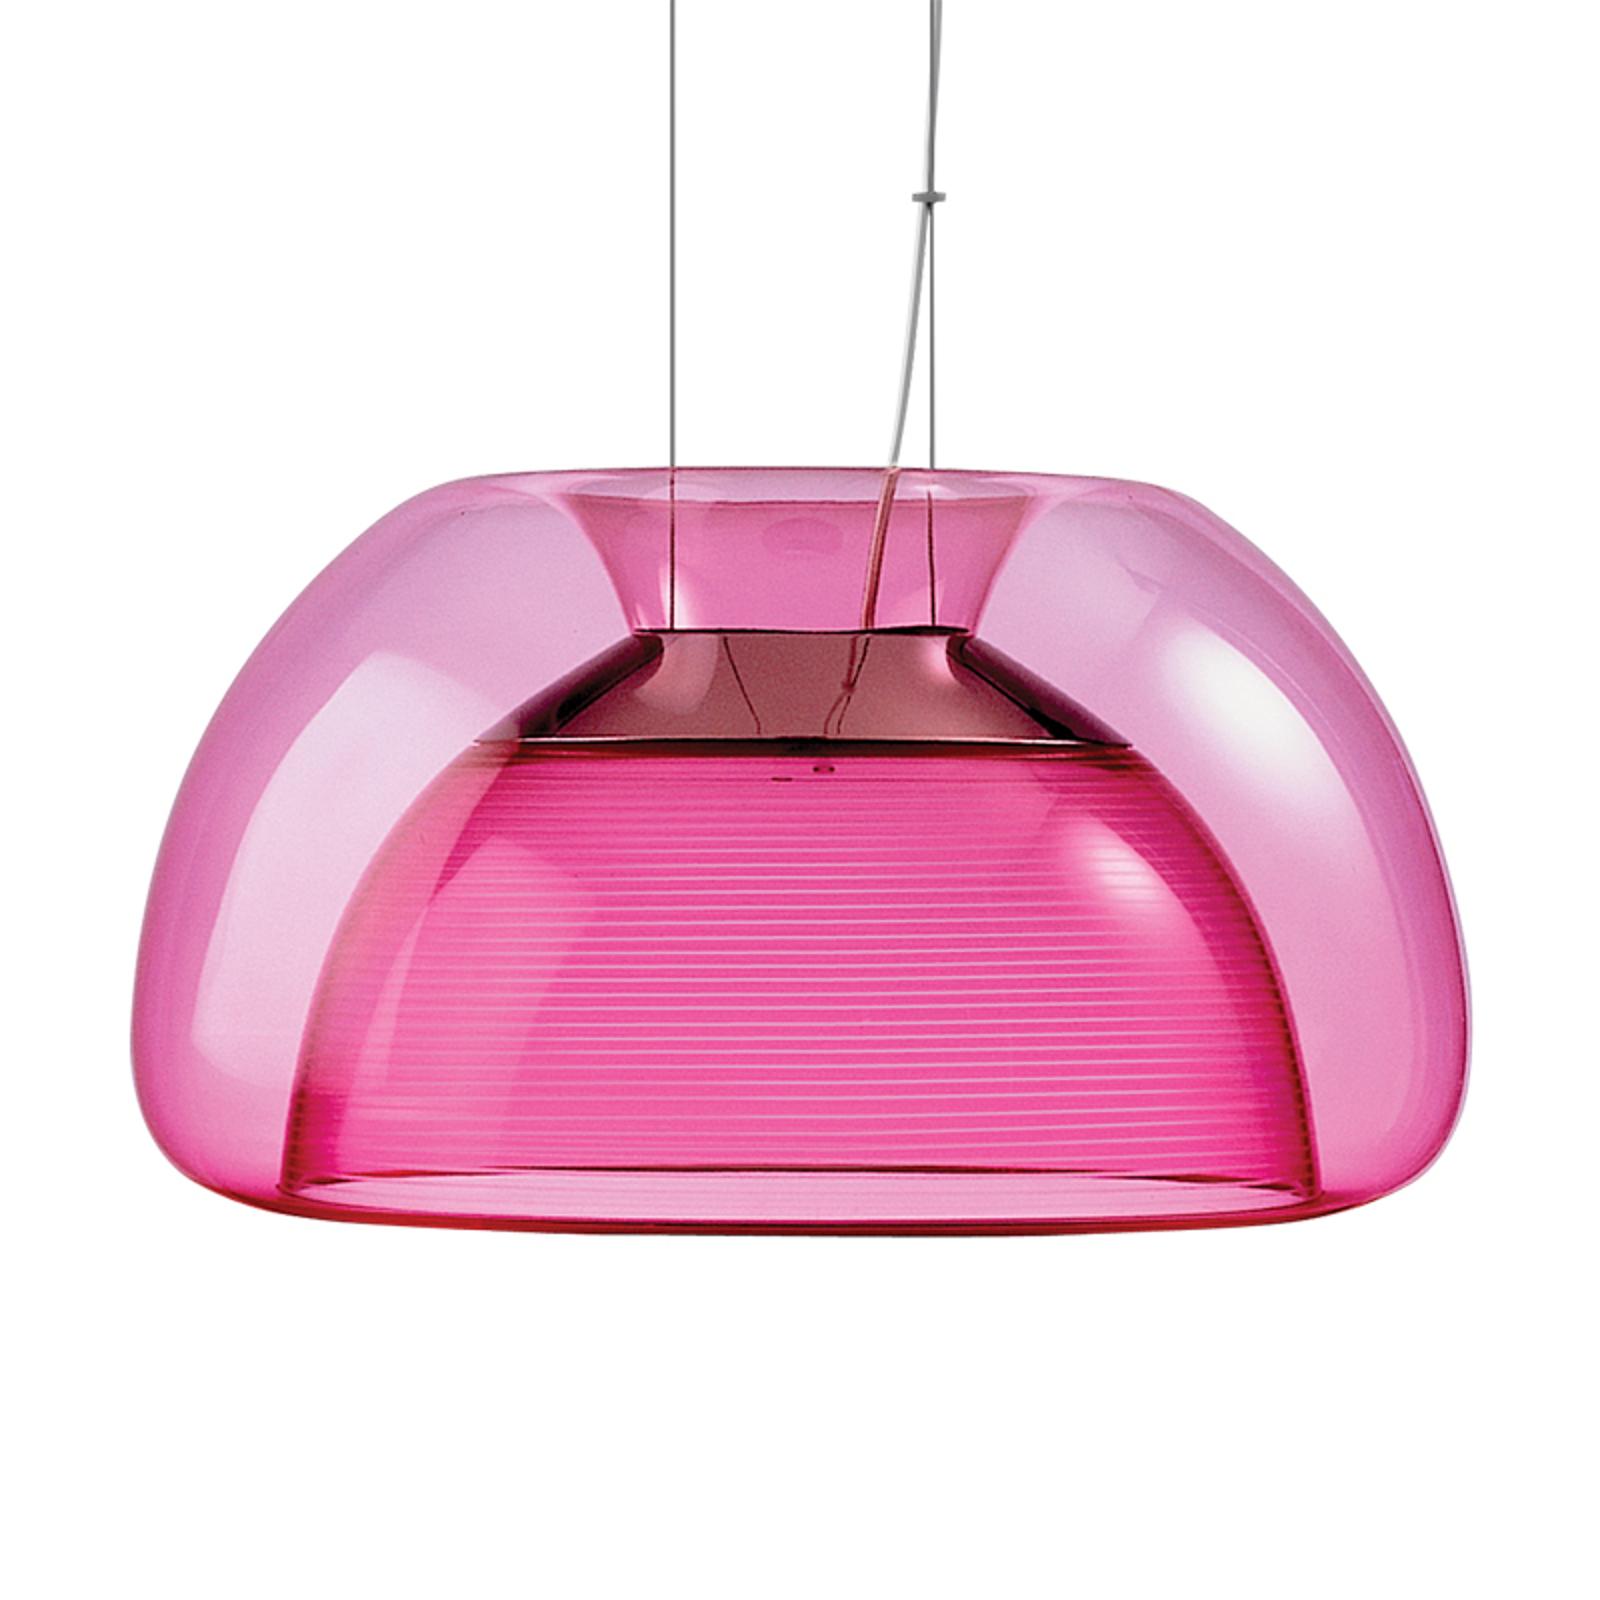 Allegra lampada LED a sospensione Aurelia, rosa